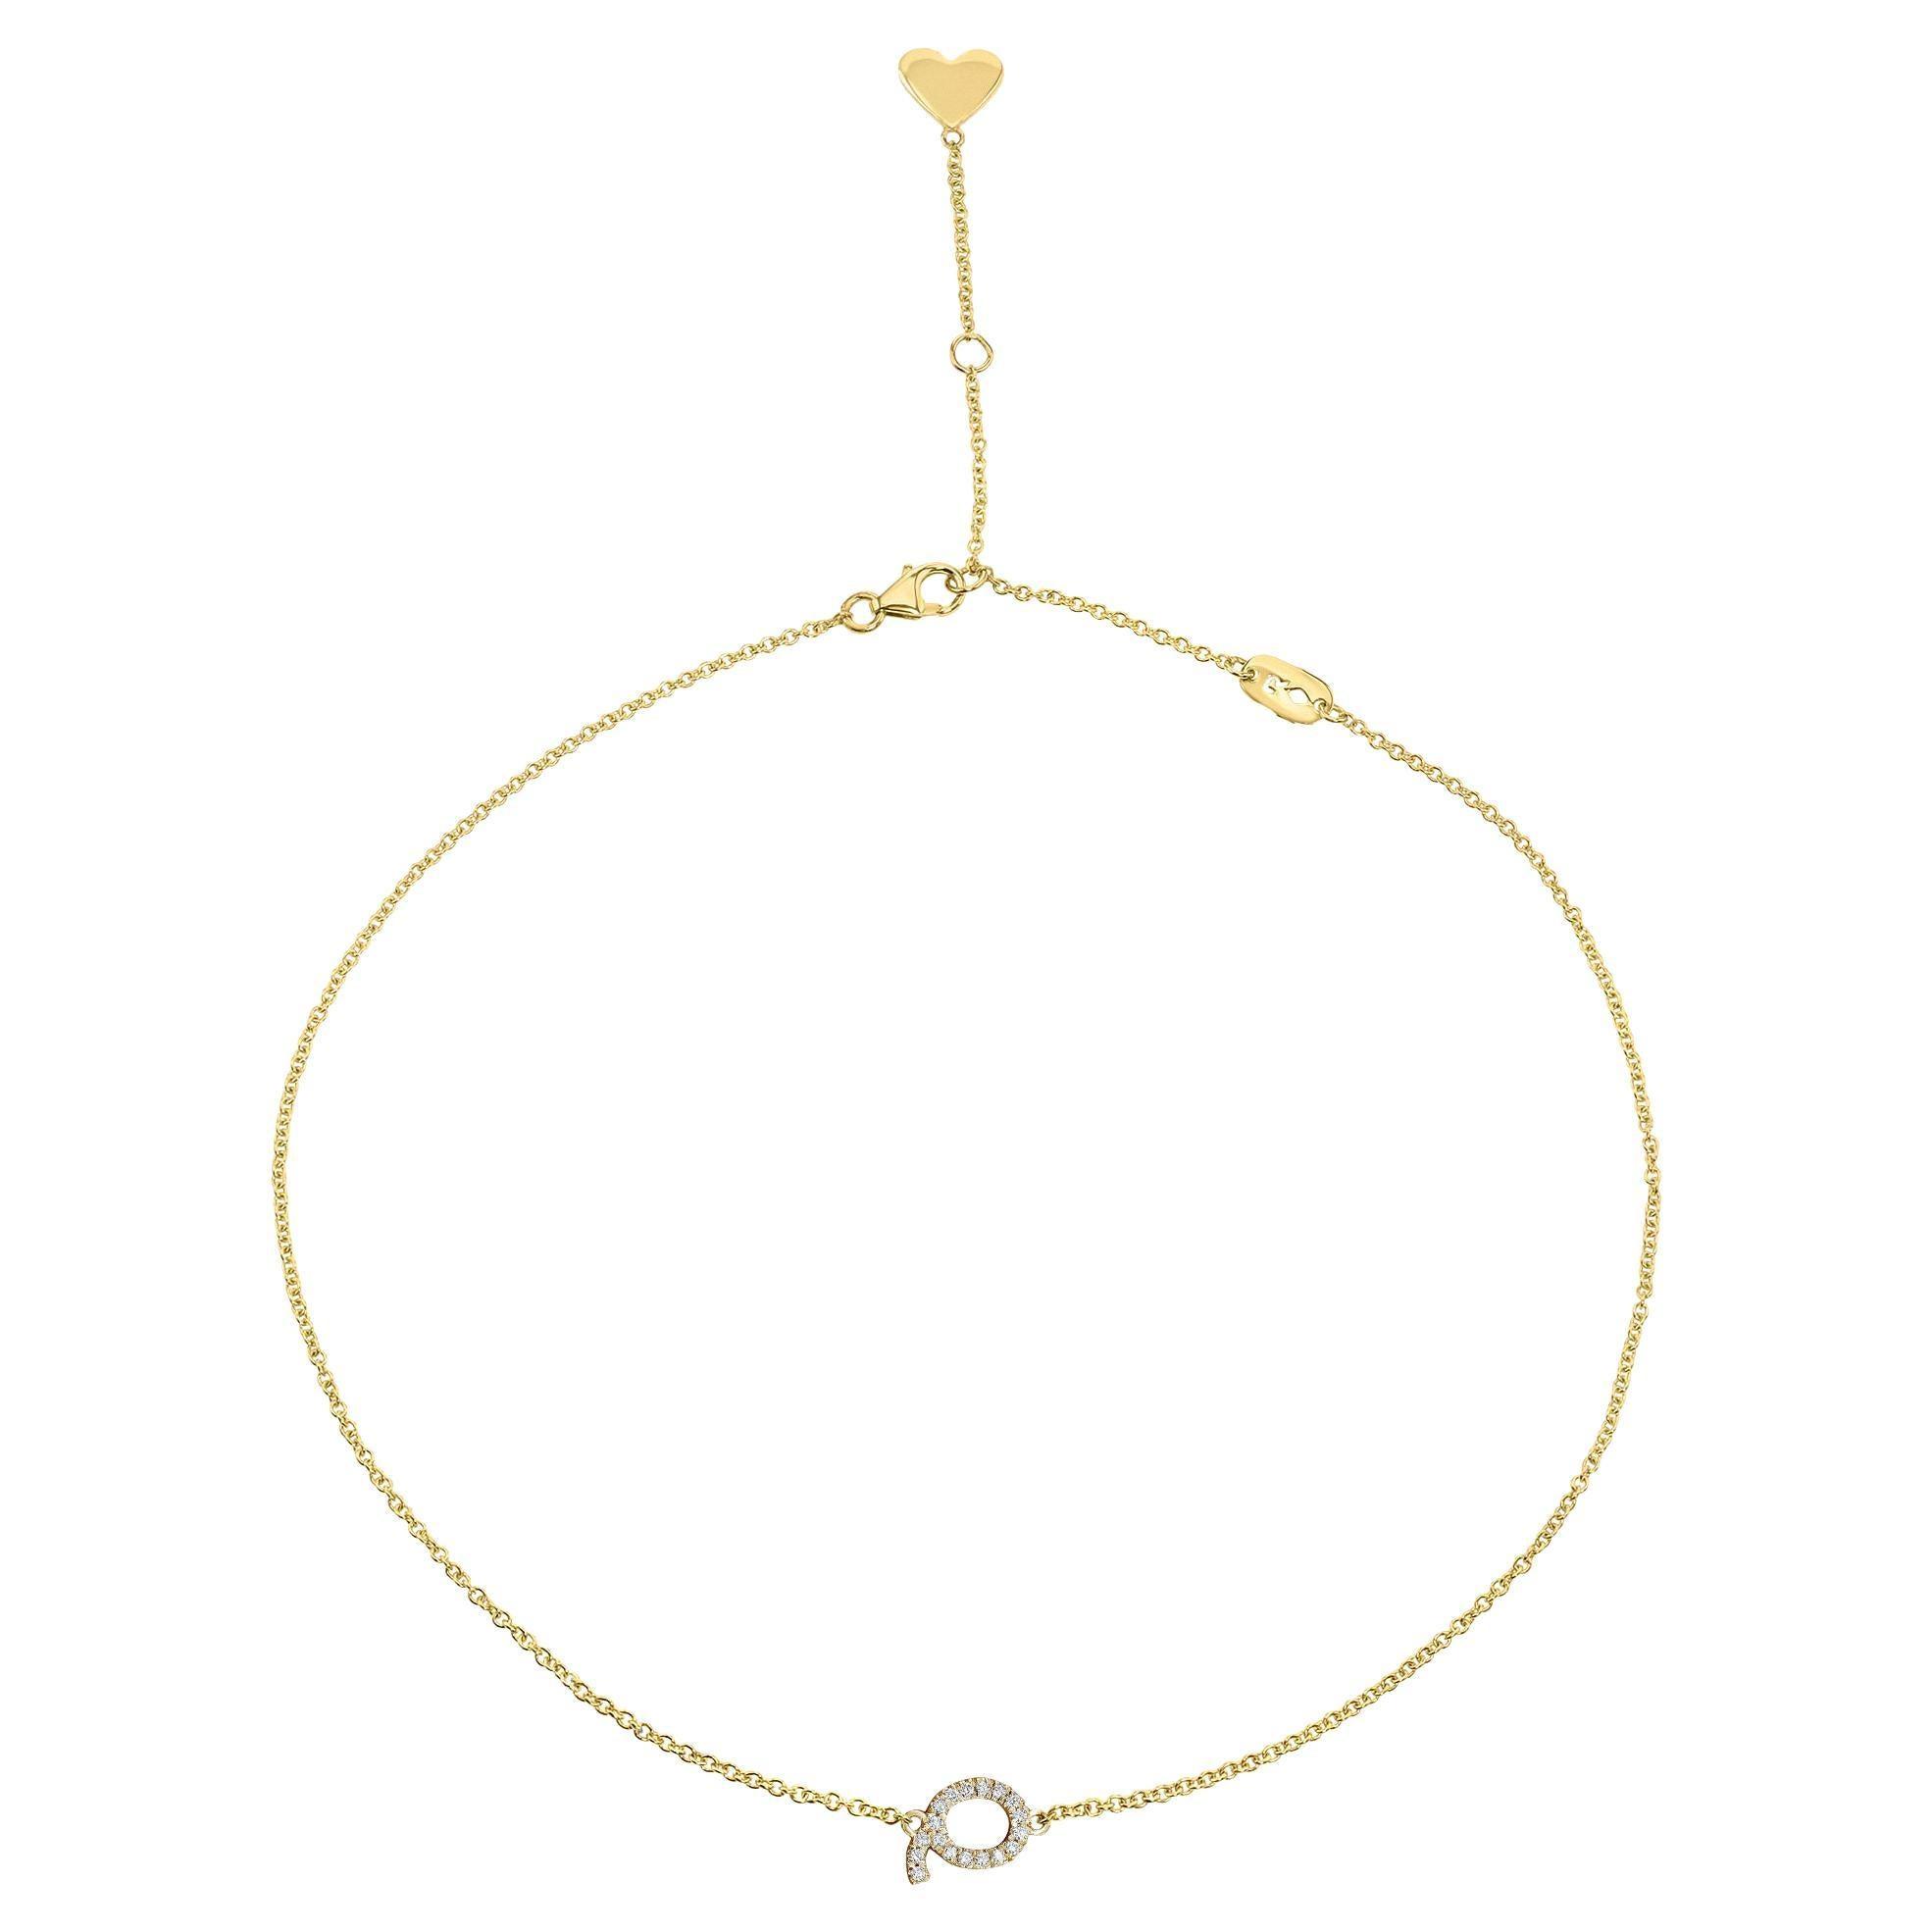 Genuine Diamond Asymmetrical Letter Necklace in 14k Yellow Gold, Shlomit Rogel